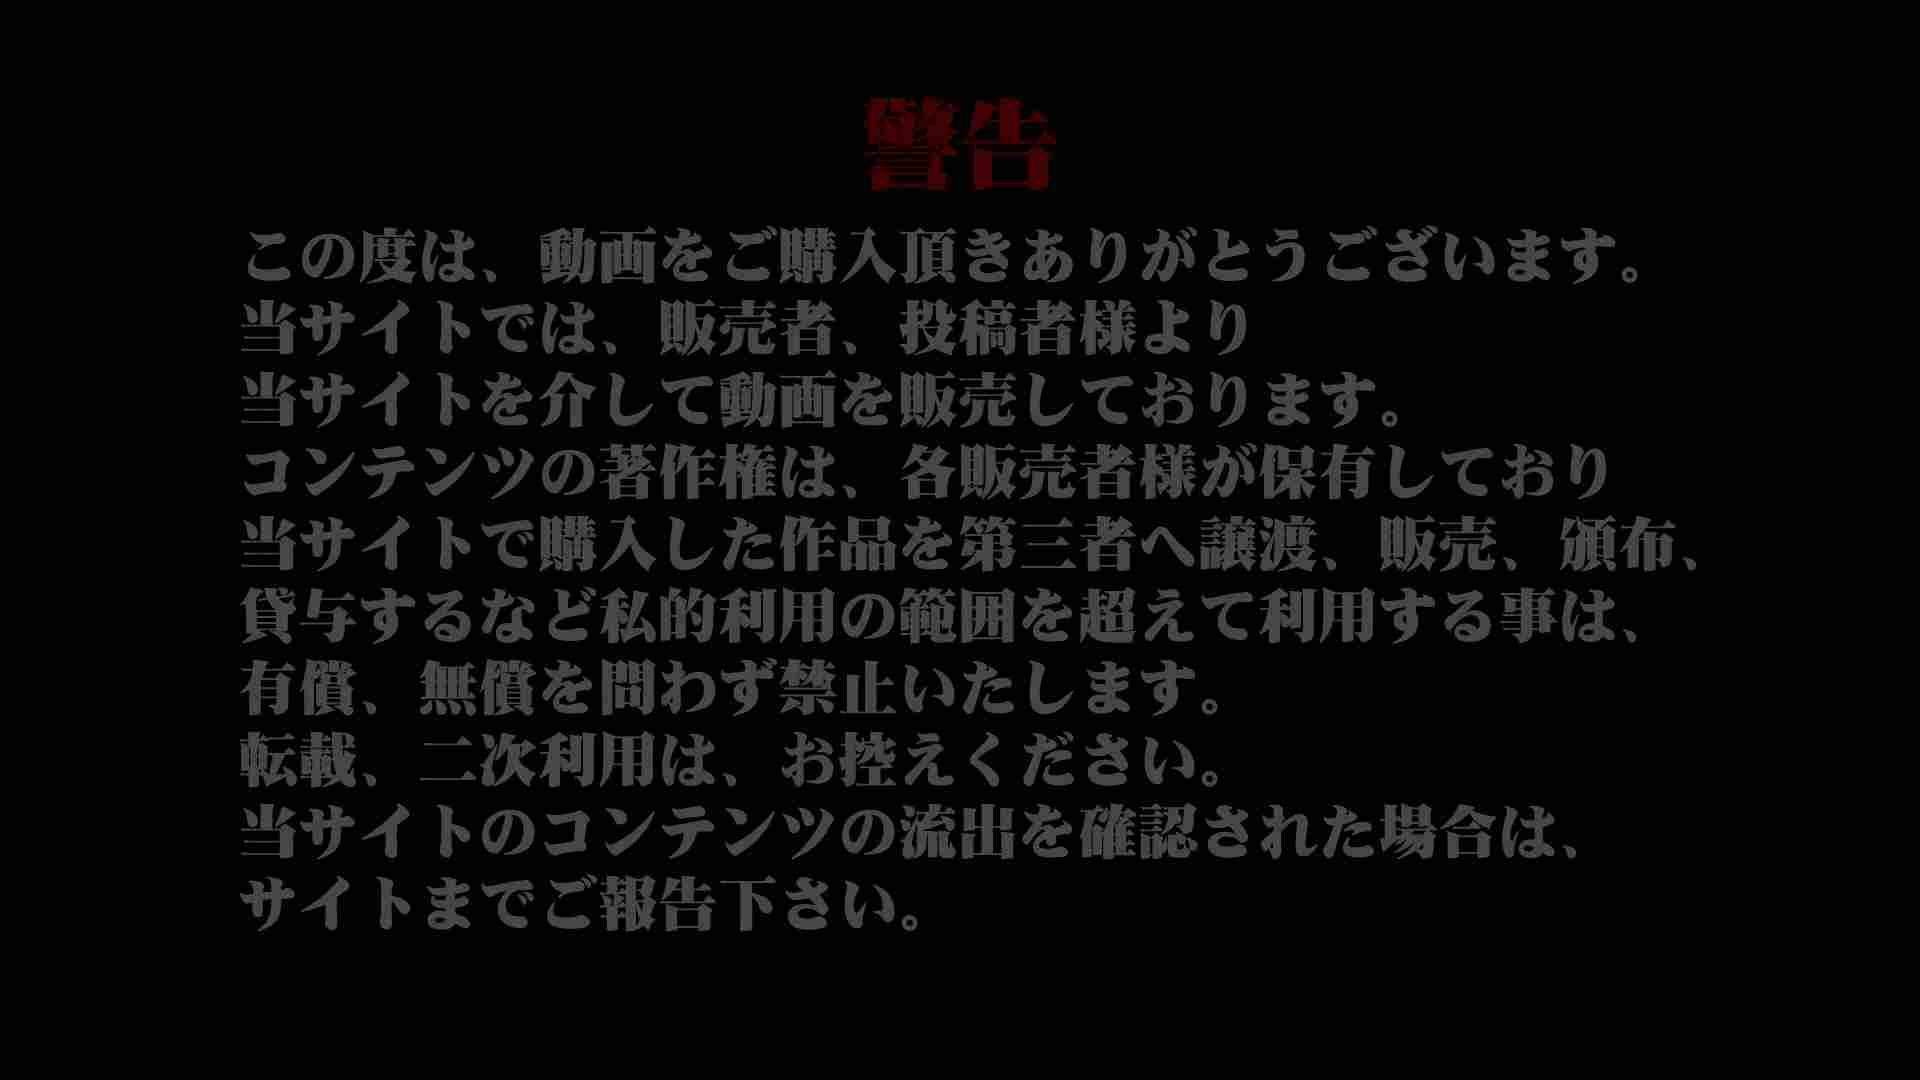 Aquaな露天風呂Vol.886 盗撮特撮 | 露天  10pic 1